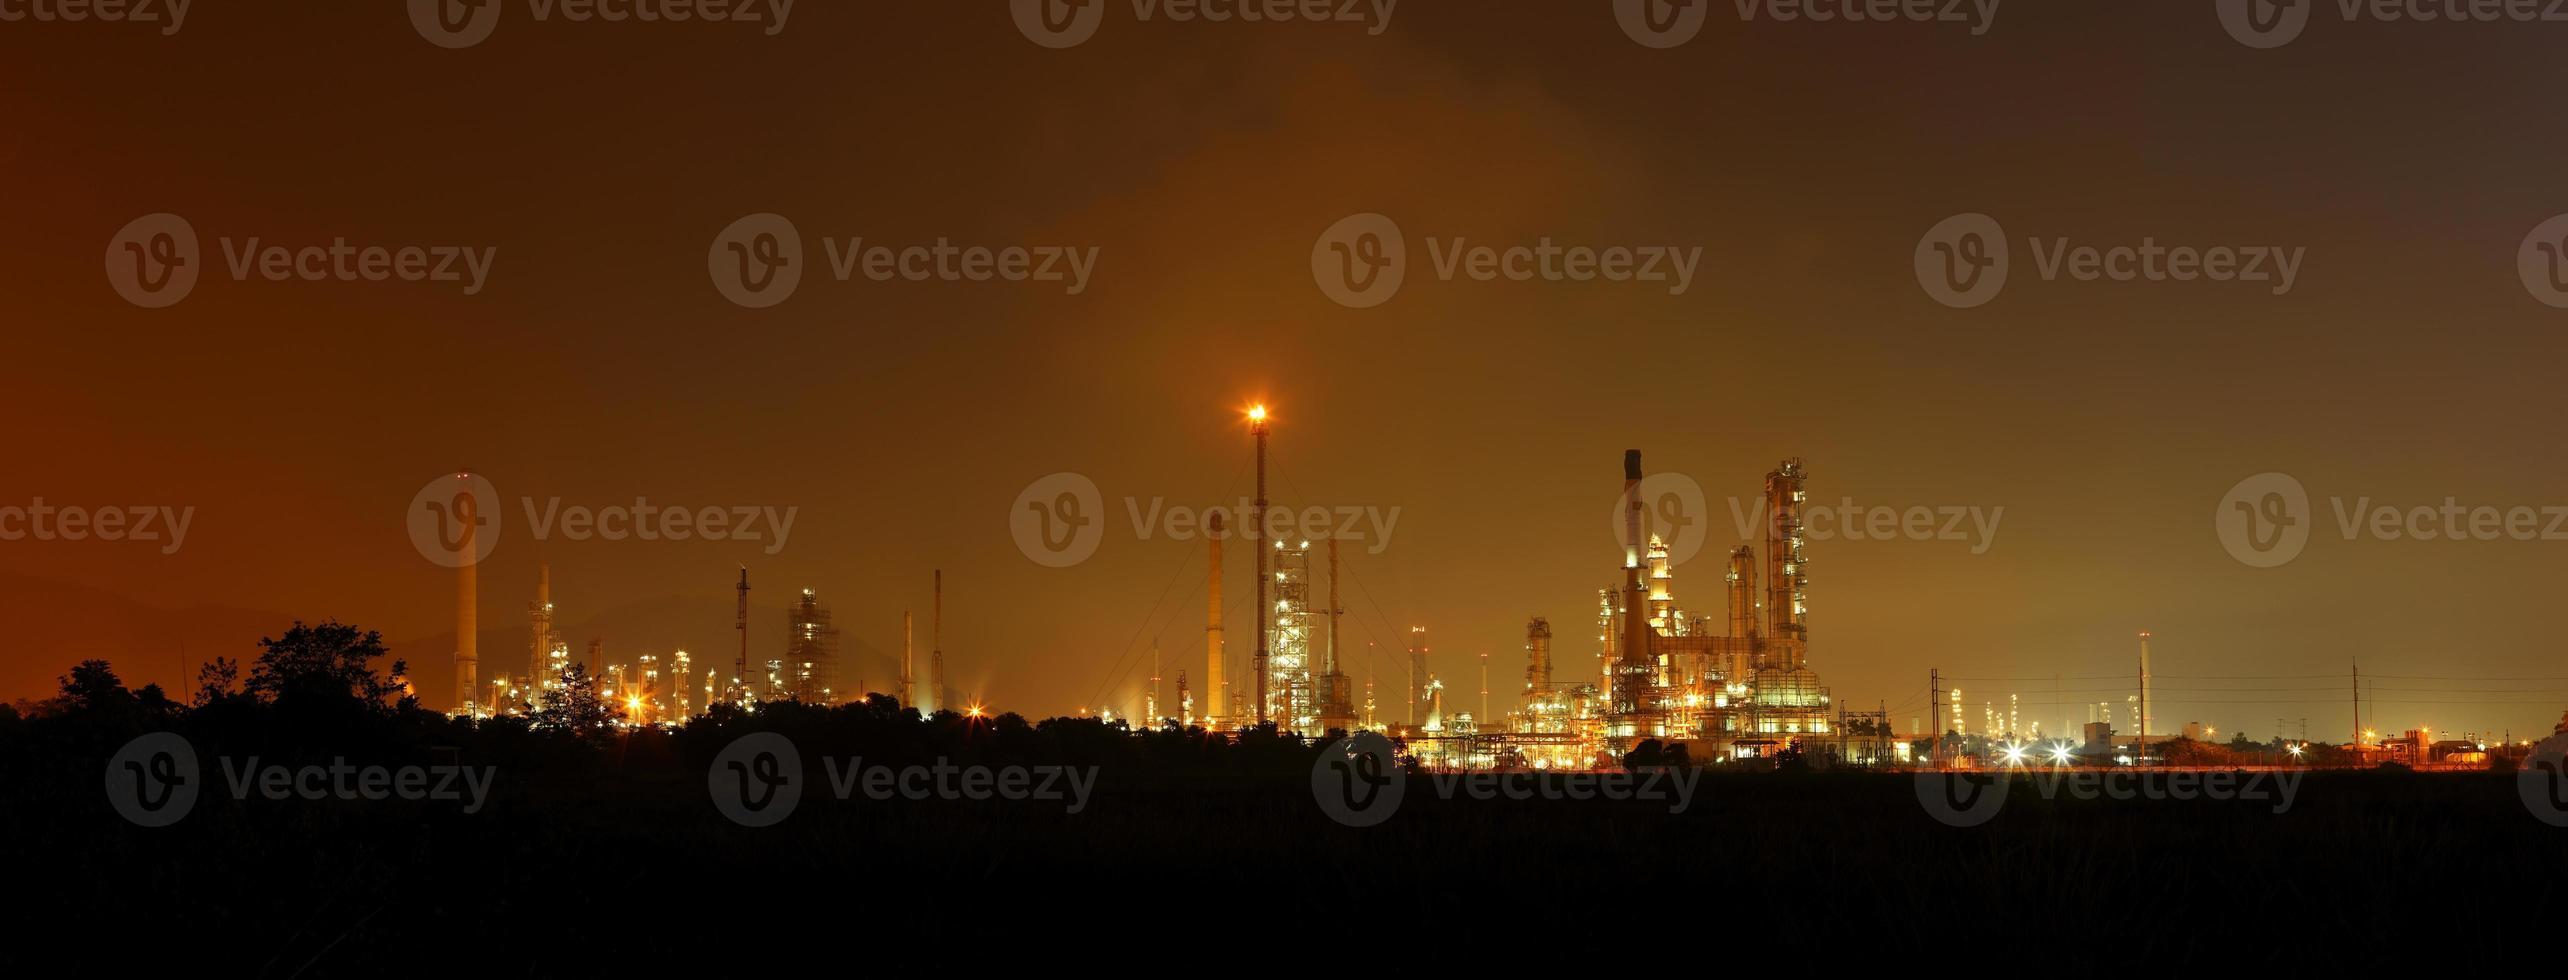 fábrica de refinaria de petróleo petroquímica foto